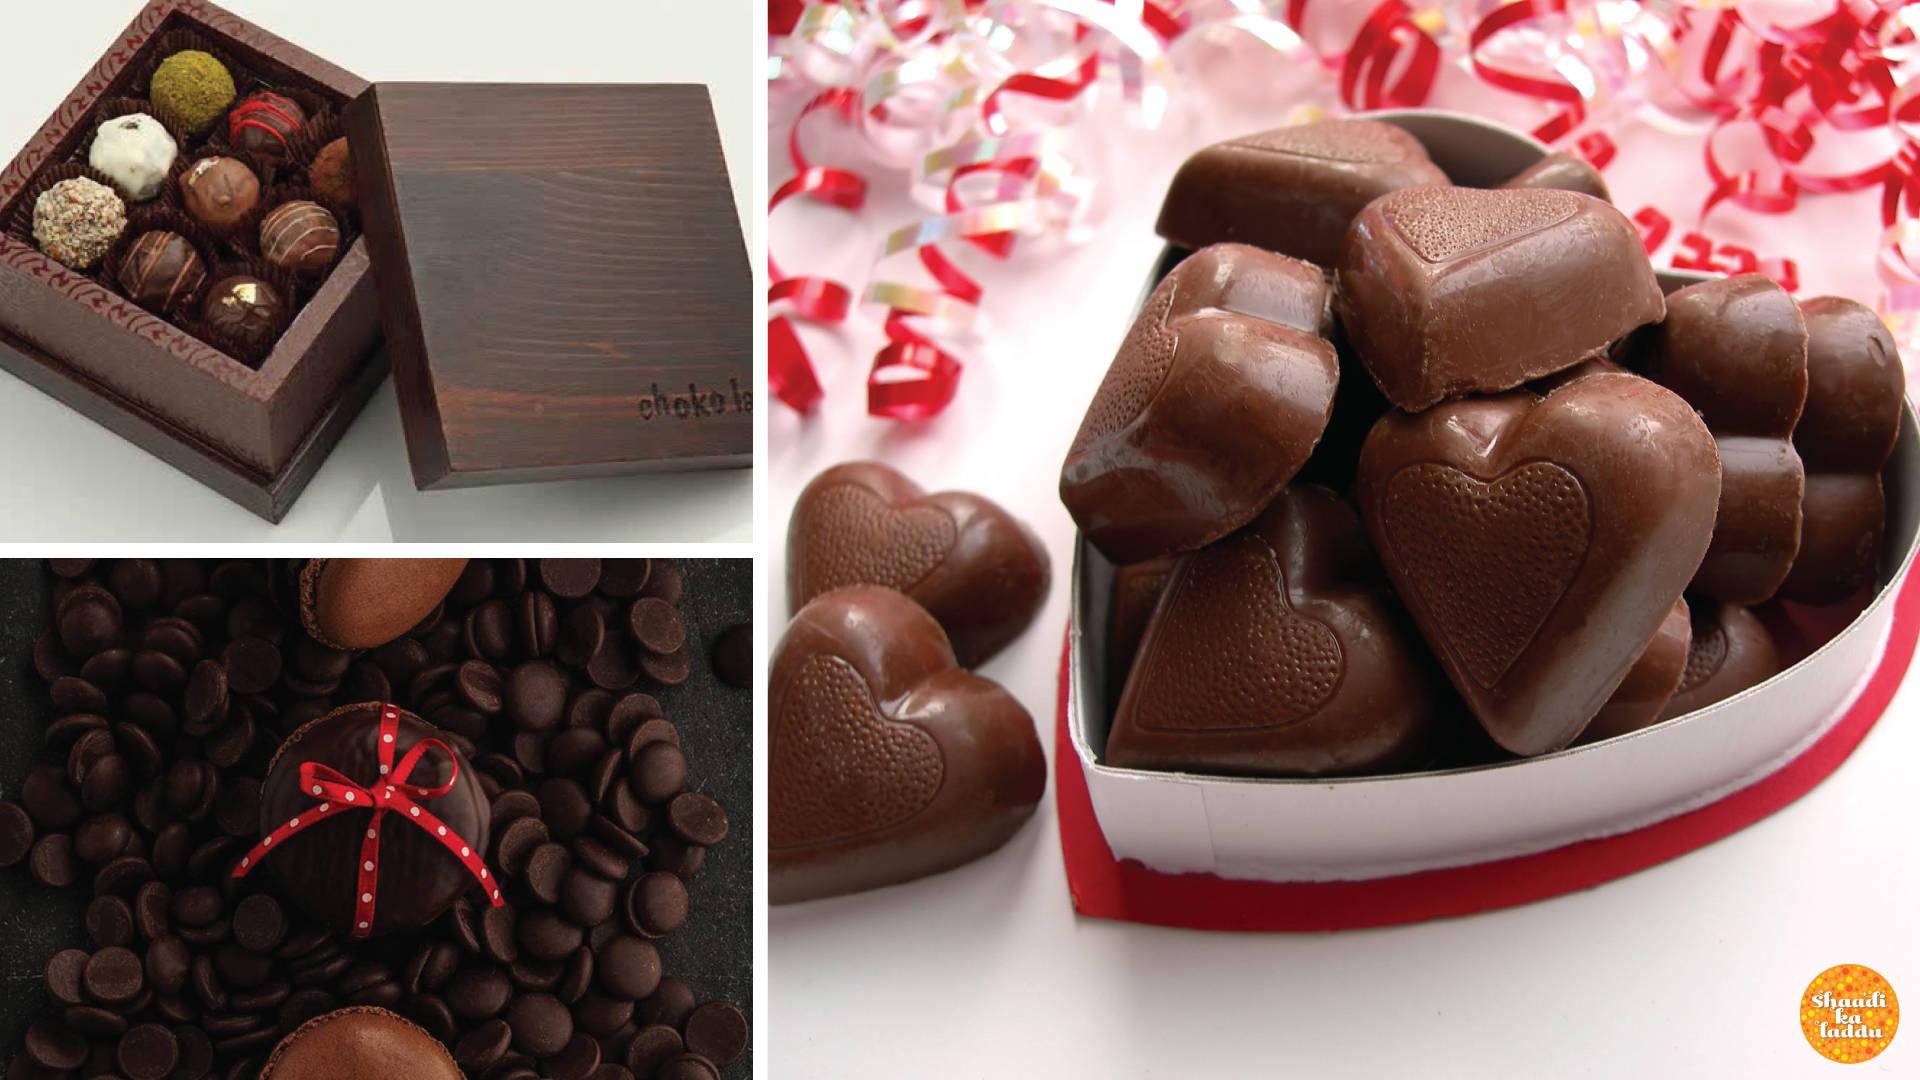 Chocolates from Chokola